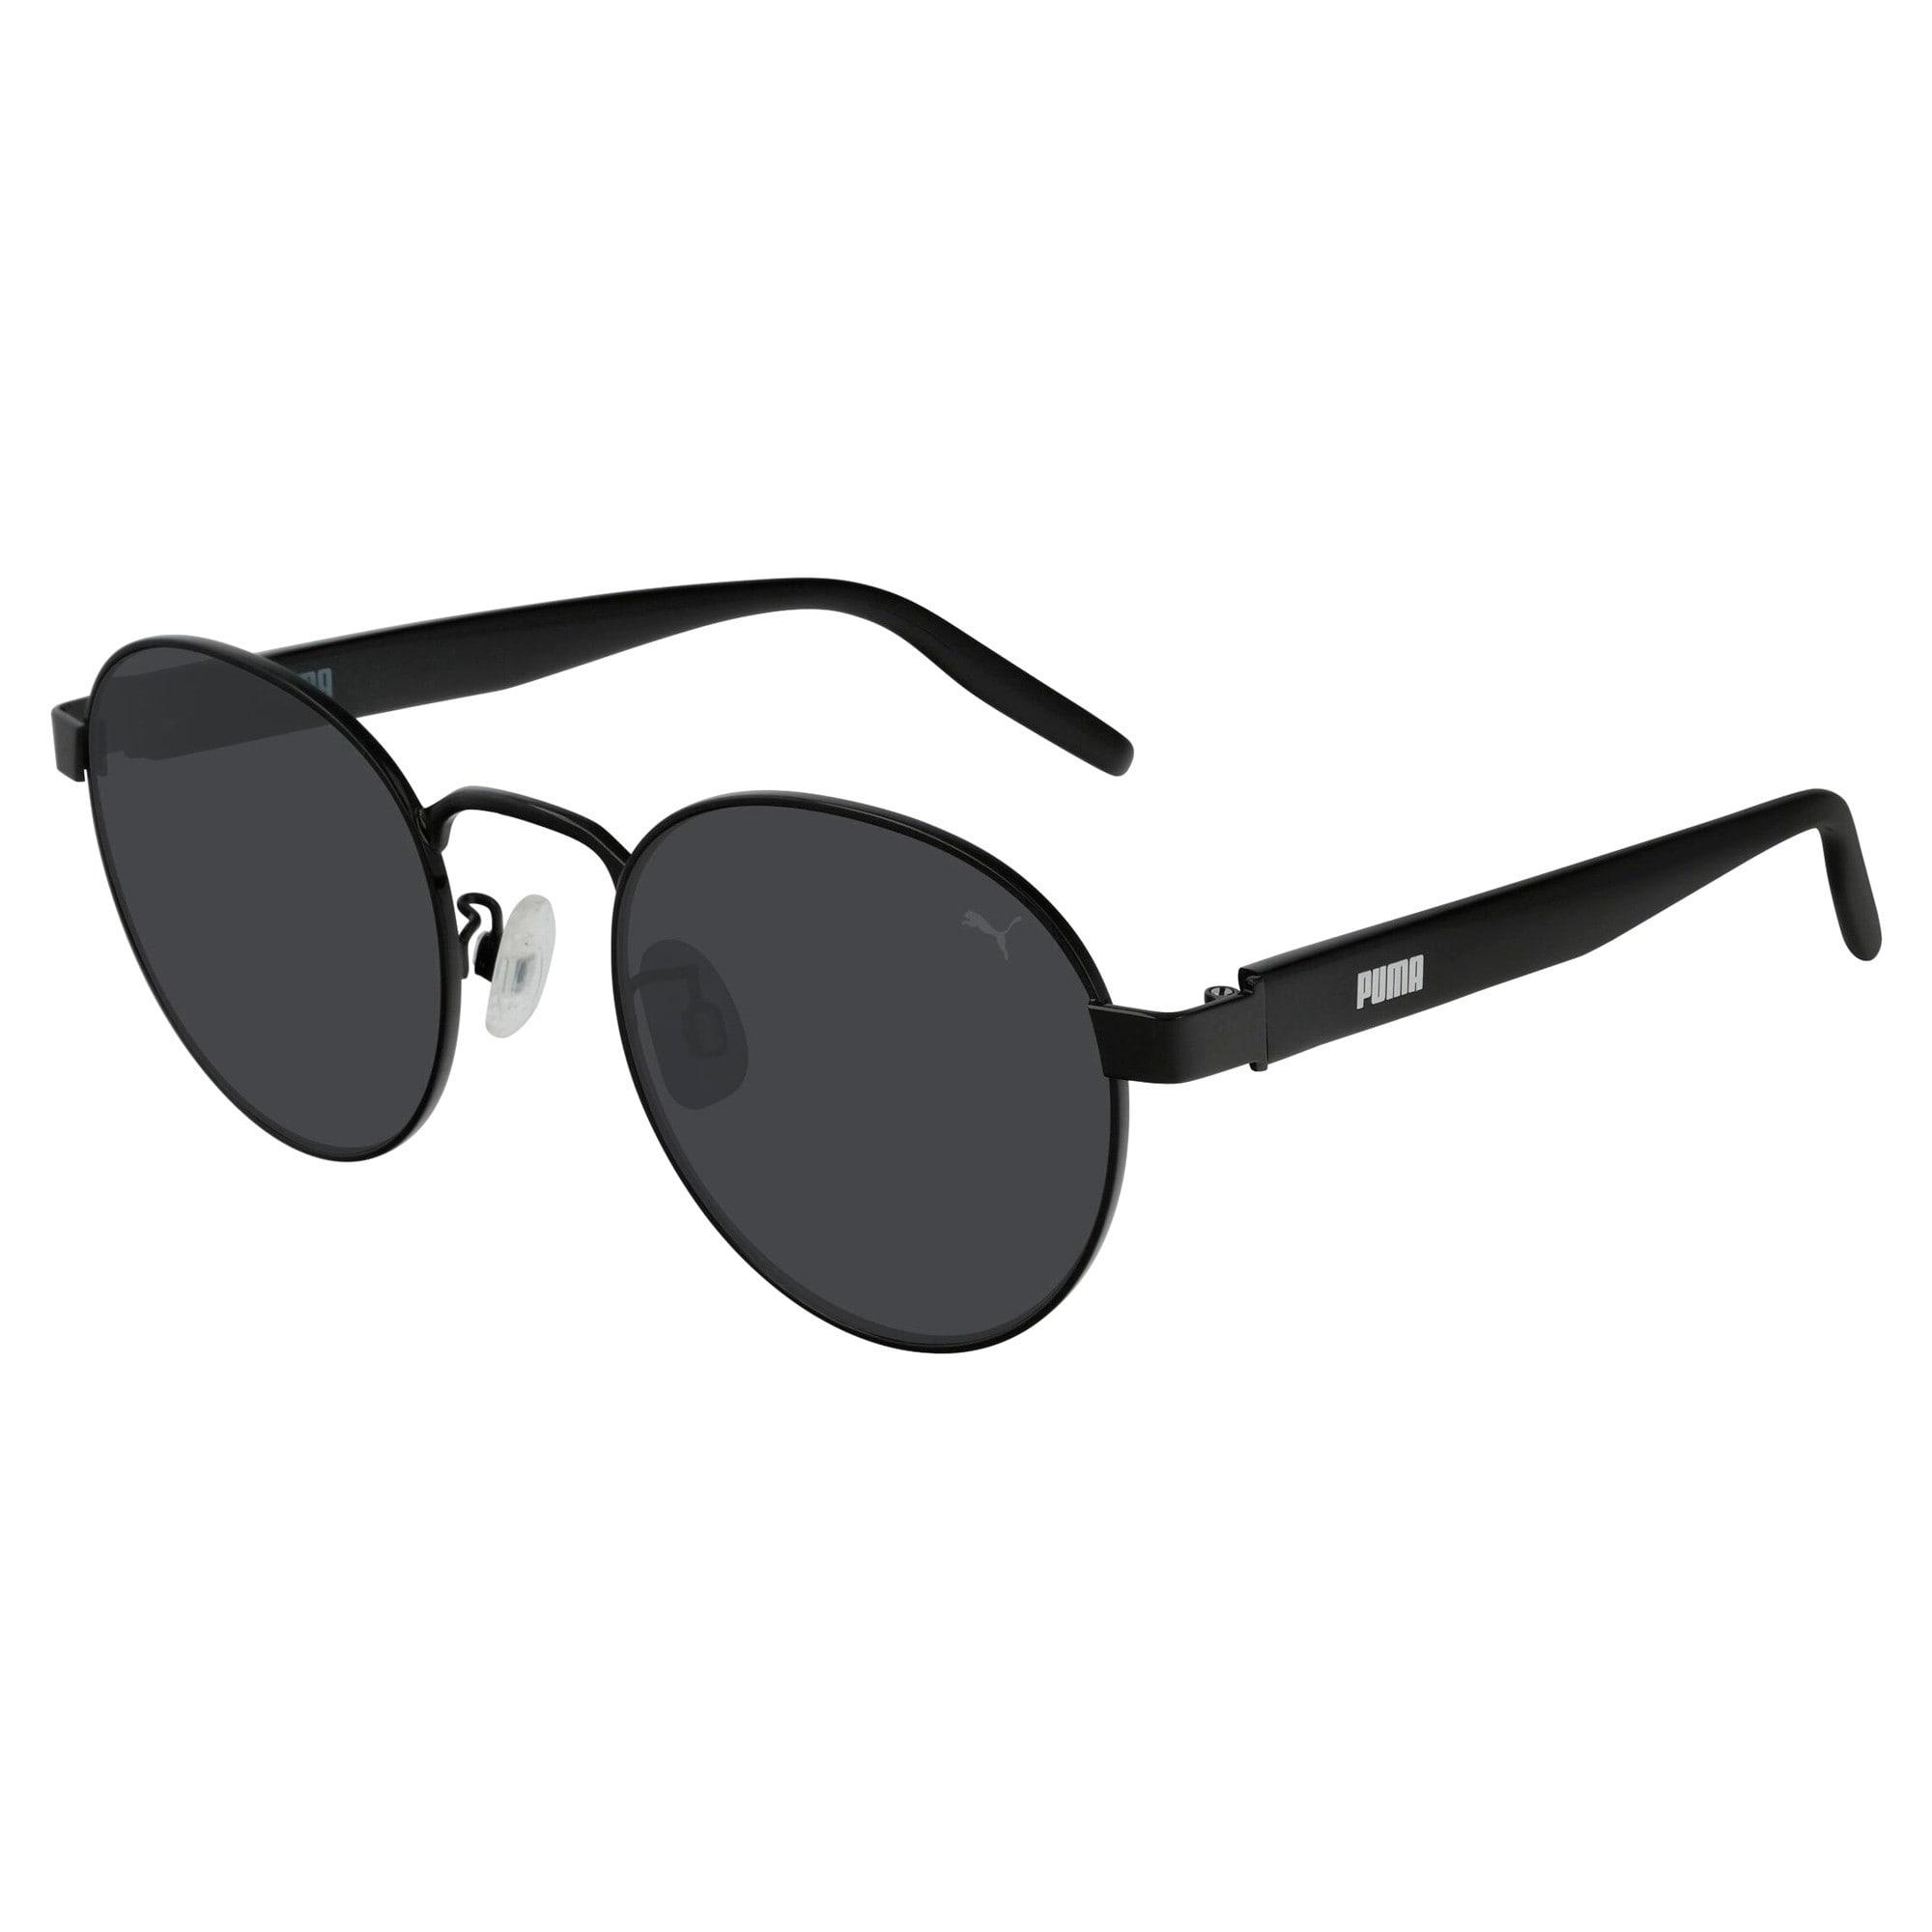 Thumbnail 1 of Sunglasses, BLACK-BLACK-SMOKE, medium